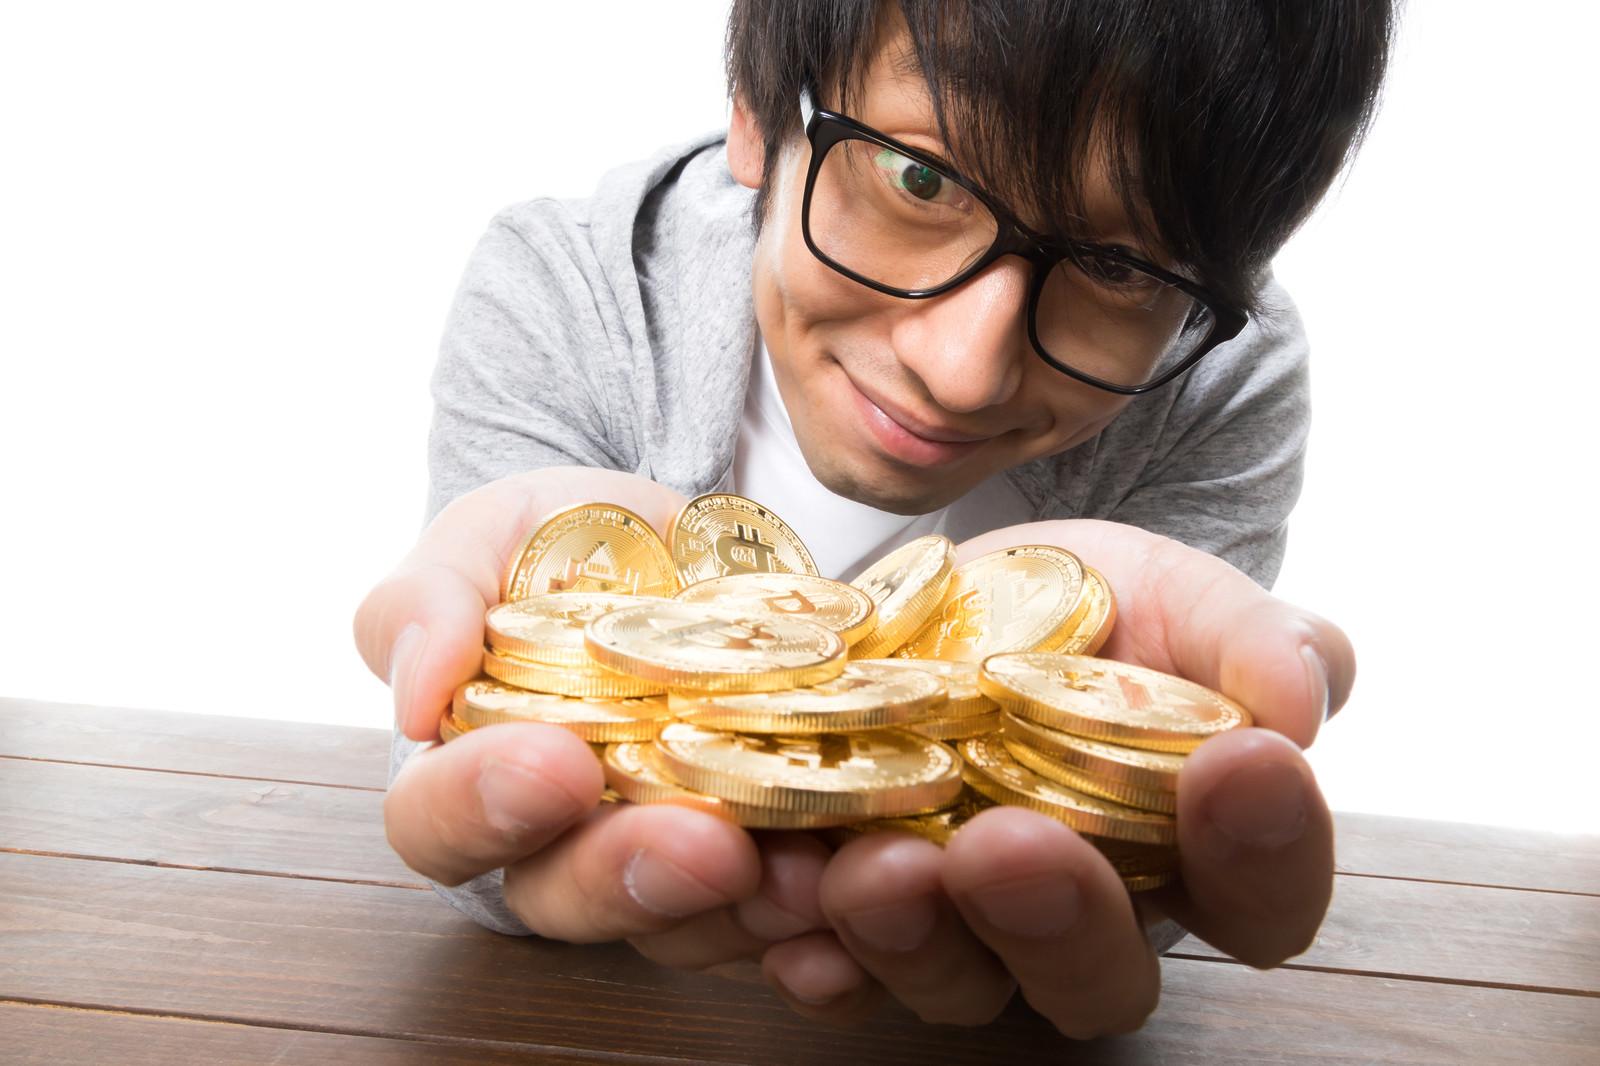 lots-of-money-and-bitcon-okawa-pakutaso.jpg